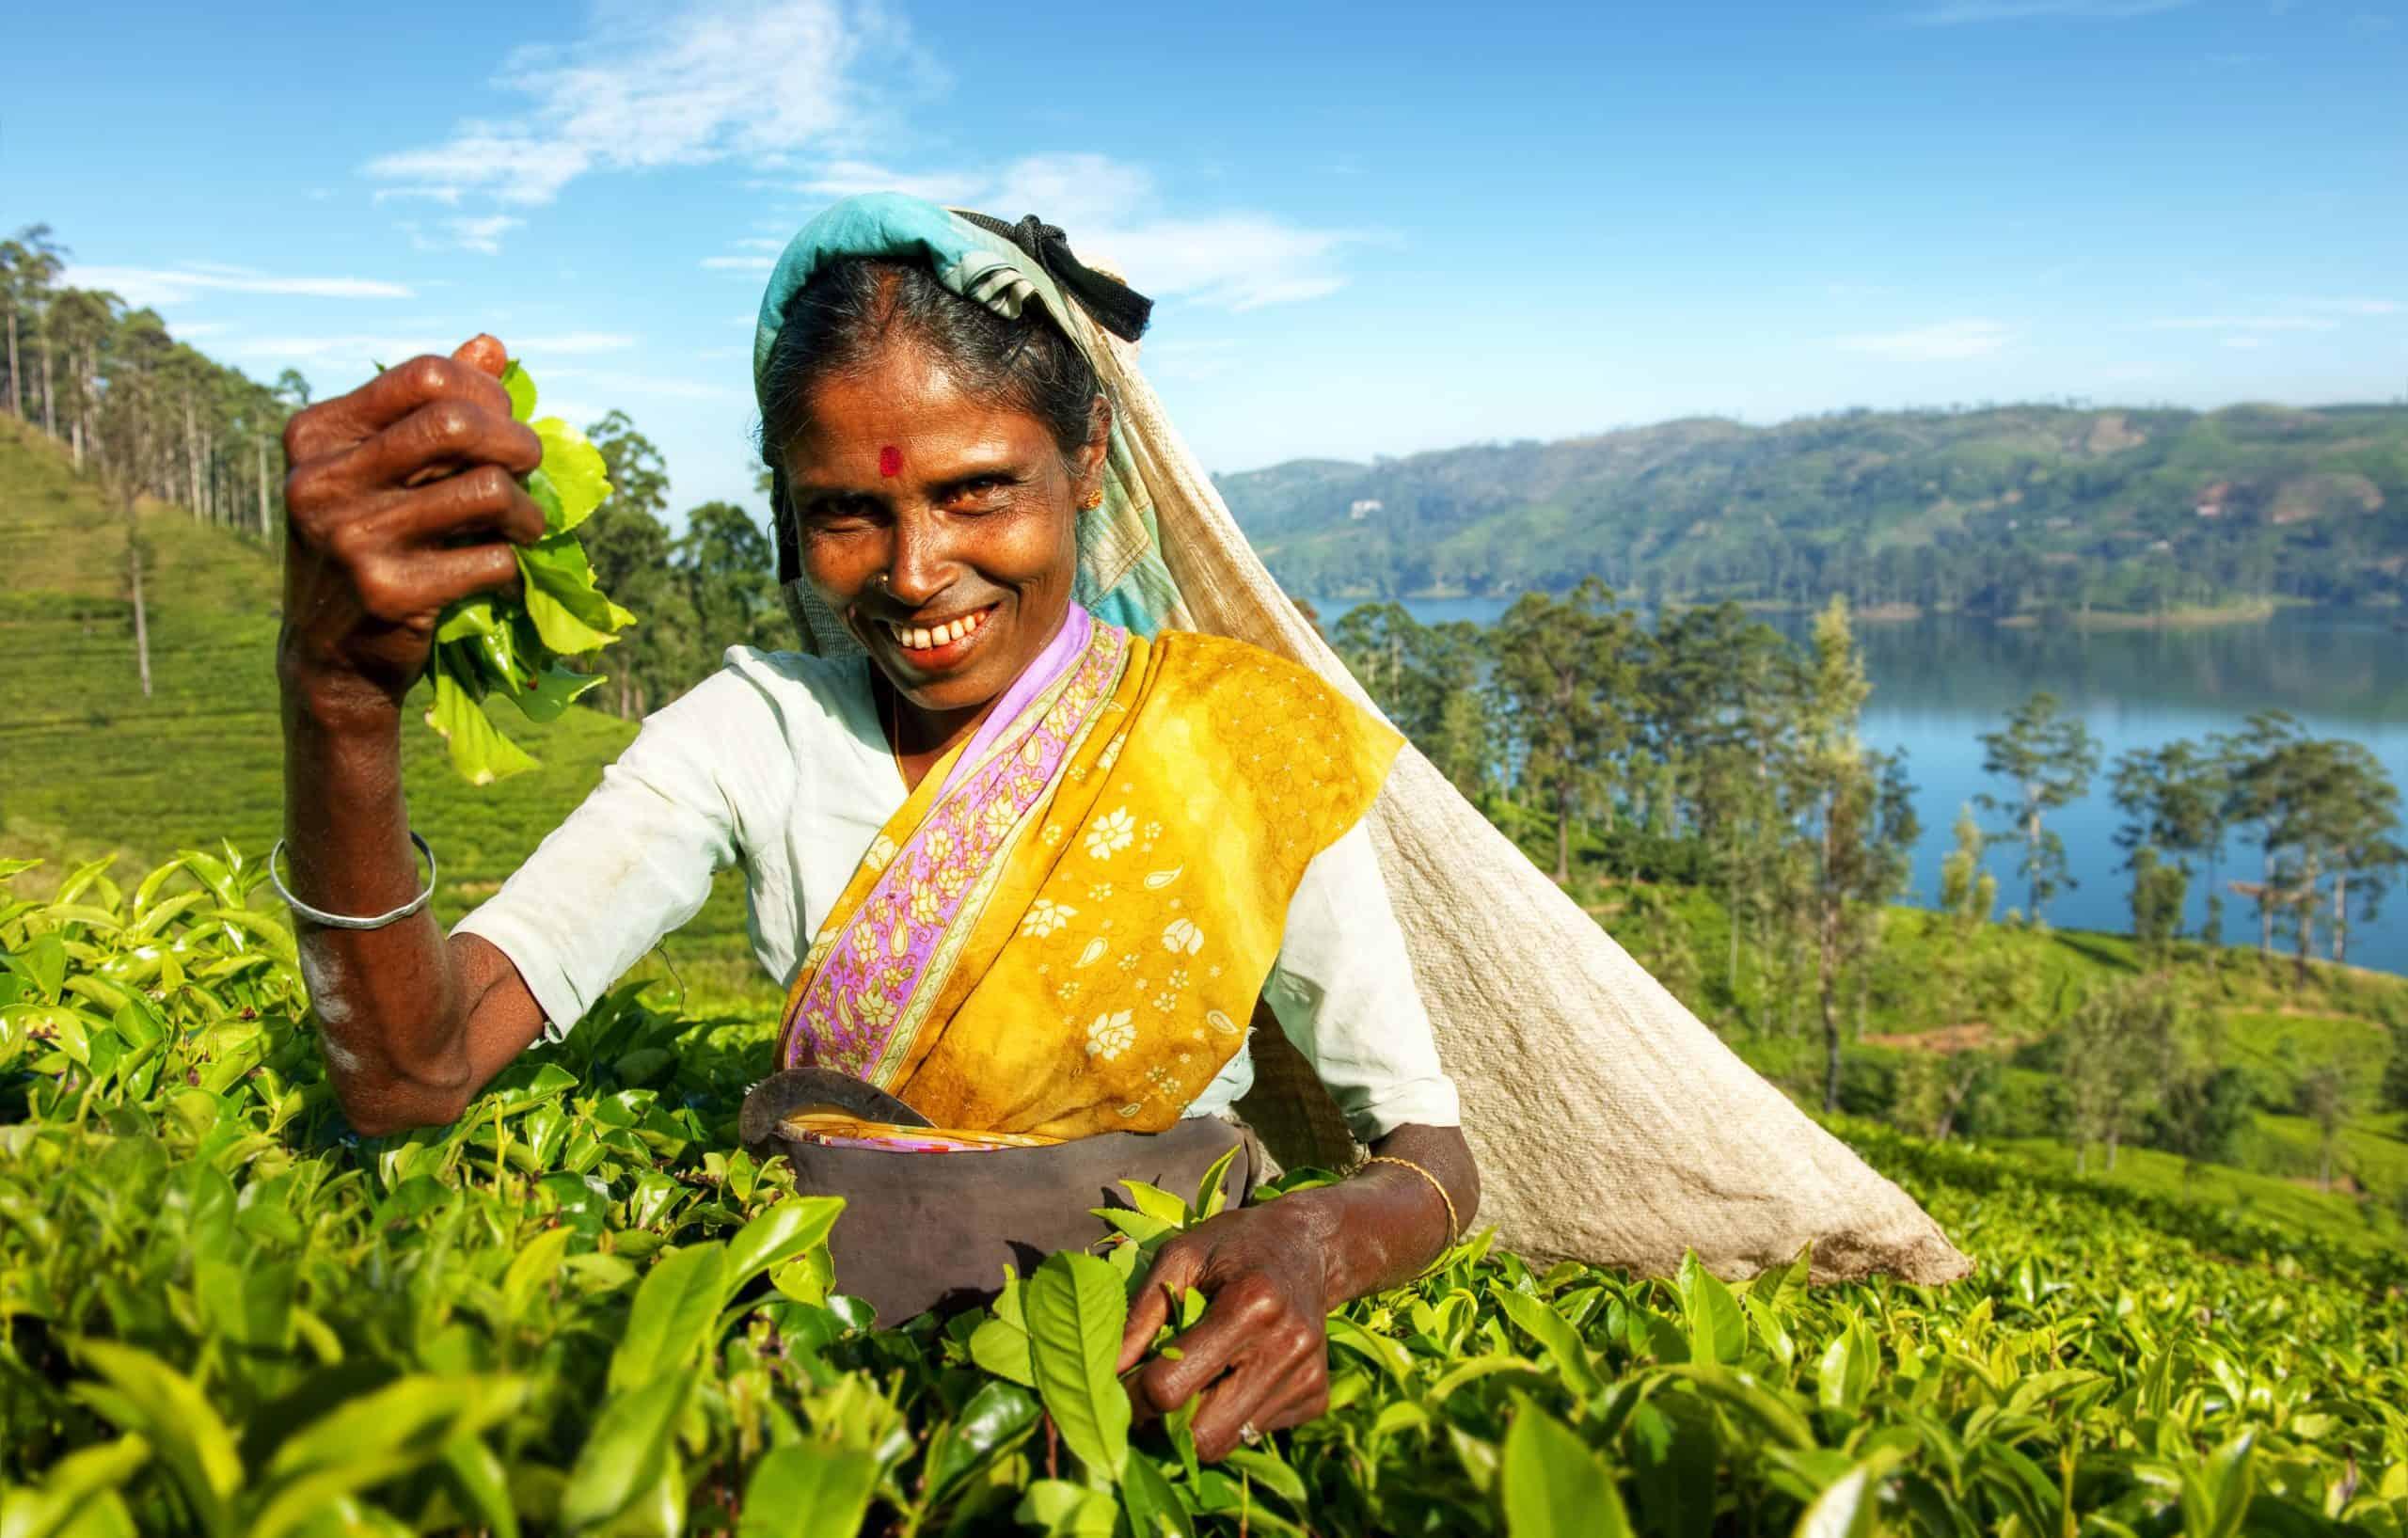 Indigenous Sri Lankan Tea Picker Harvesting Shutterstock 314749064